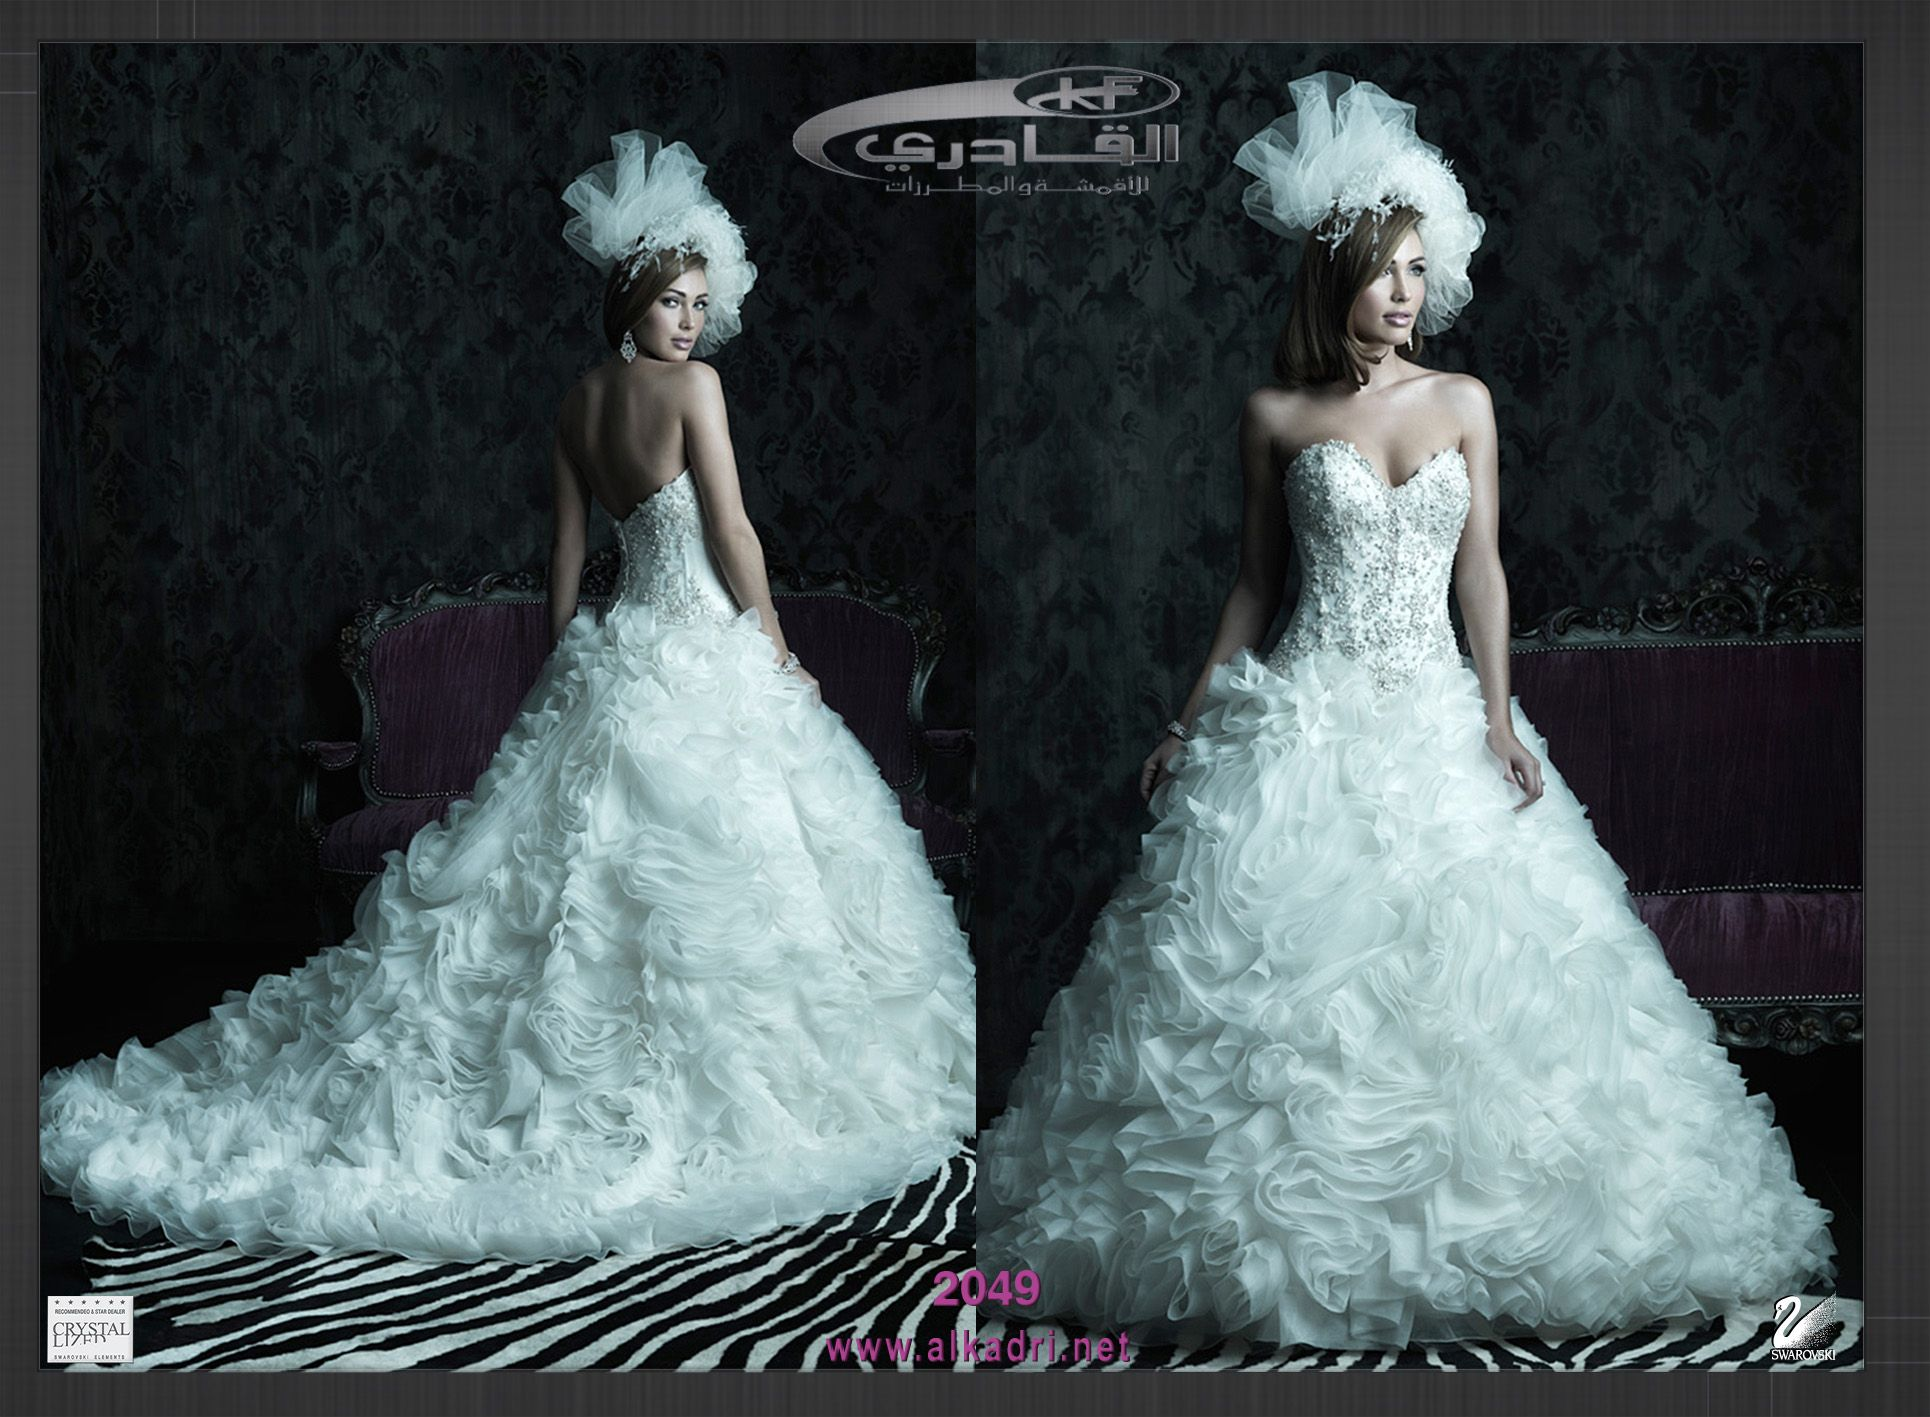 Https Www Facebook Com Alkadriforcouture Haute Coutre Collection Yemen Sana A Gamal St Tel 967 1 498 140 Dresses Wedding Dresses Sleeveless Wedding Dress